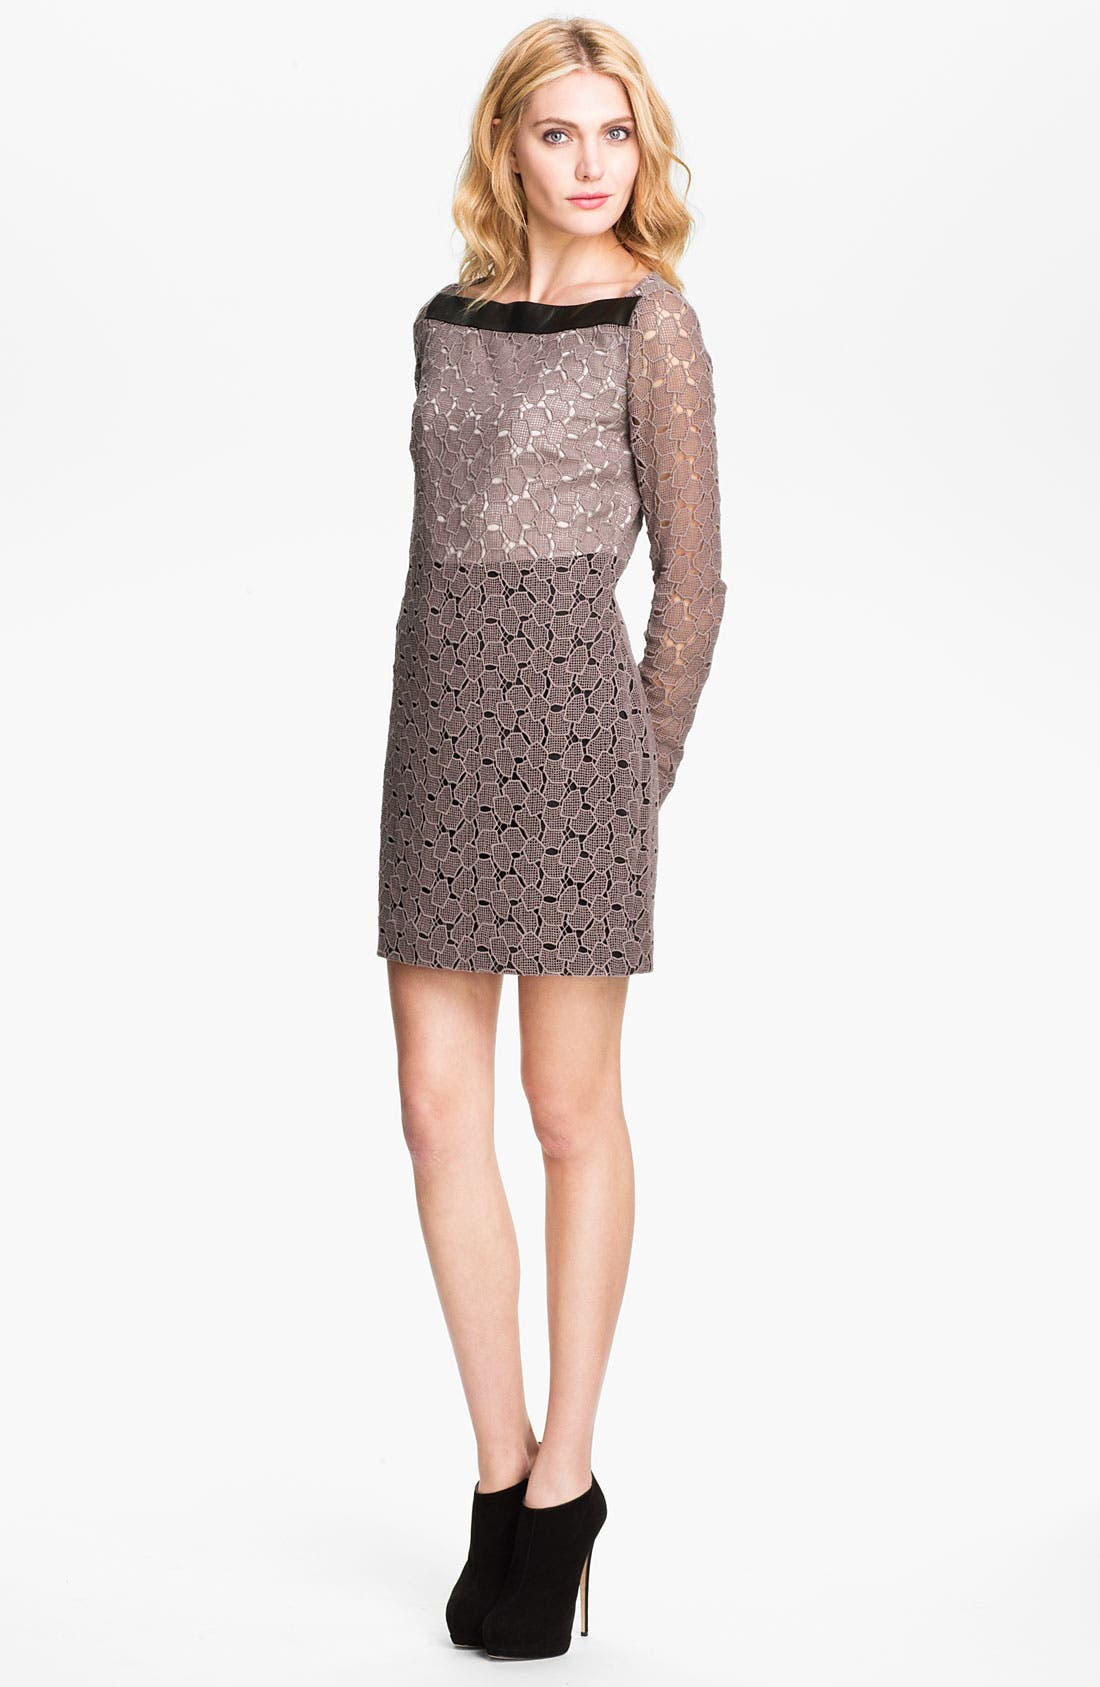 Alternate Image 1 Selected - Diane von Furstenberg 'New Sarita Pebble' Lace Shift Dress